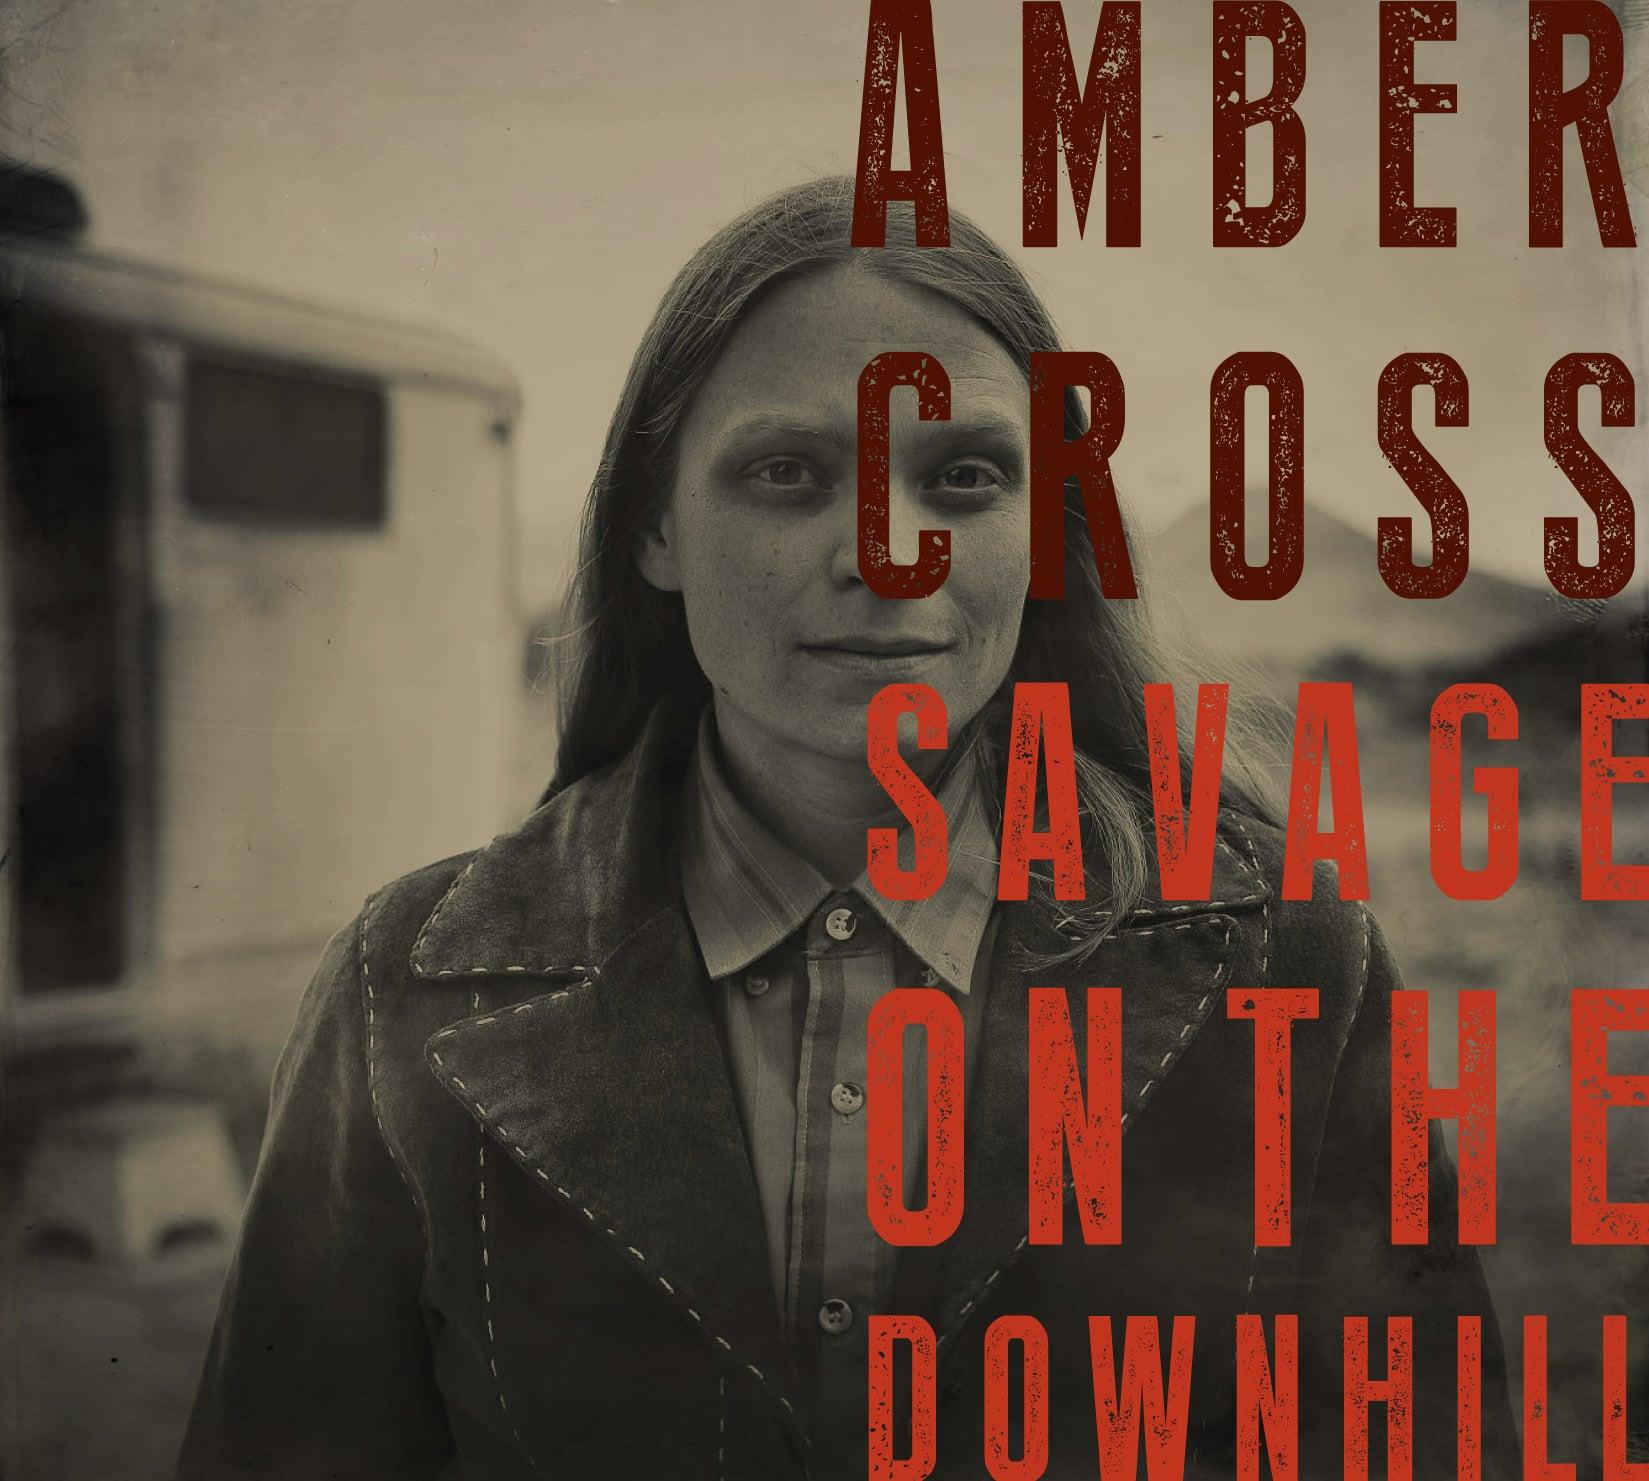 Amber Cross' album cover